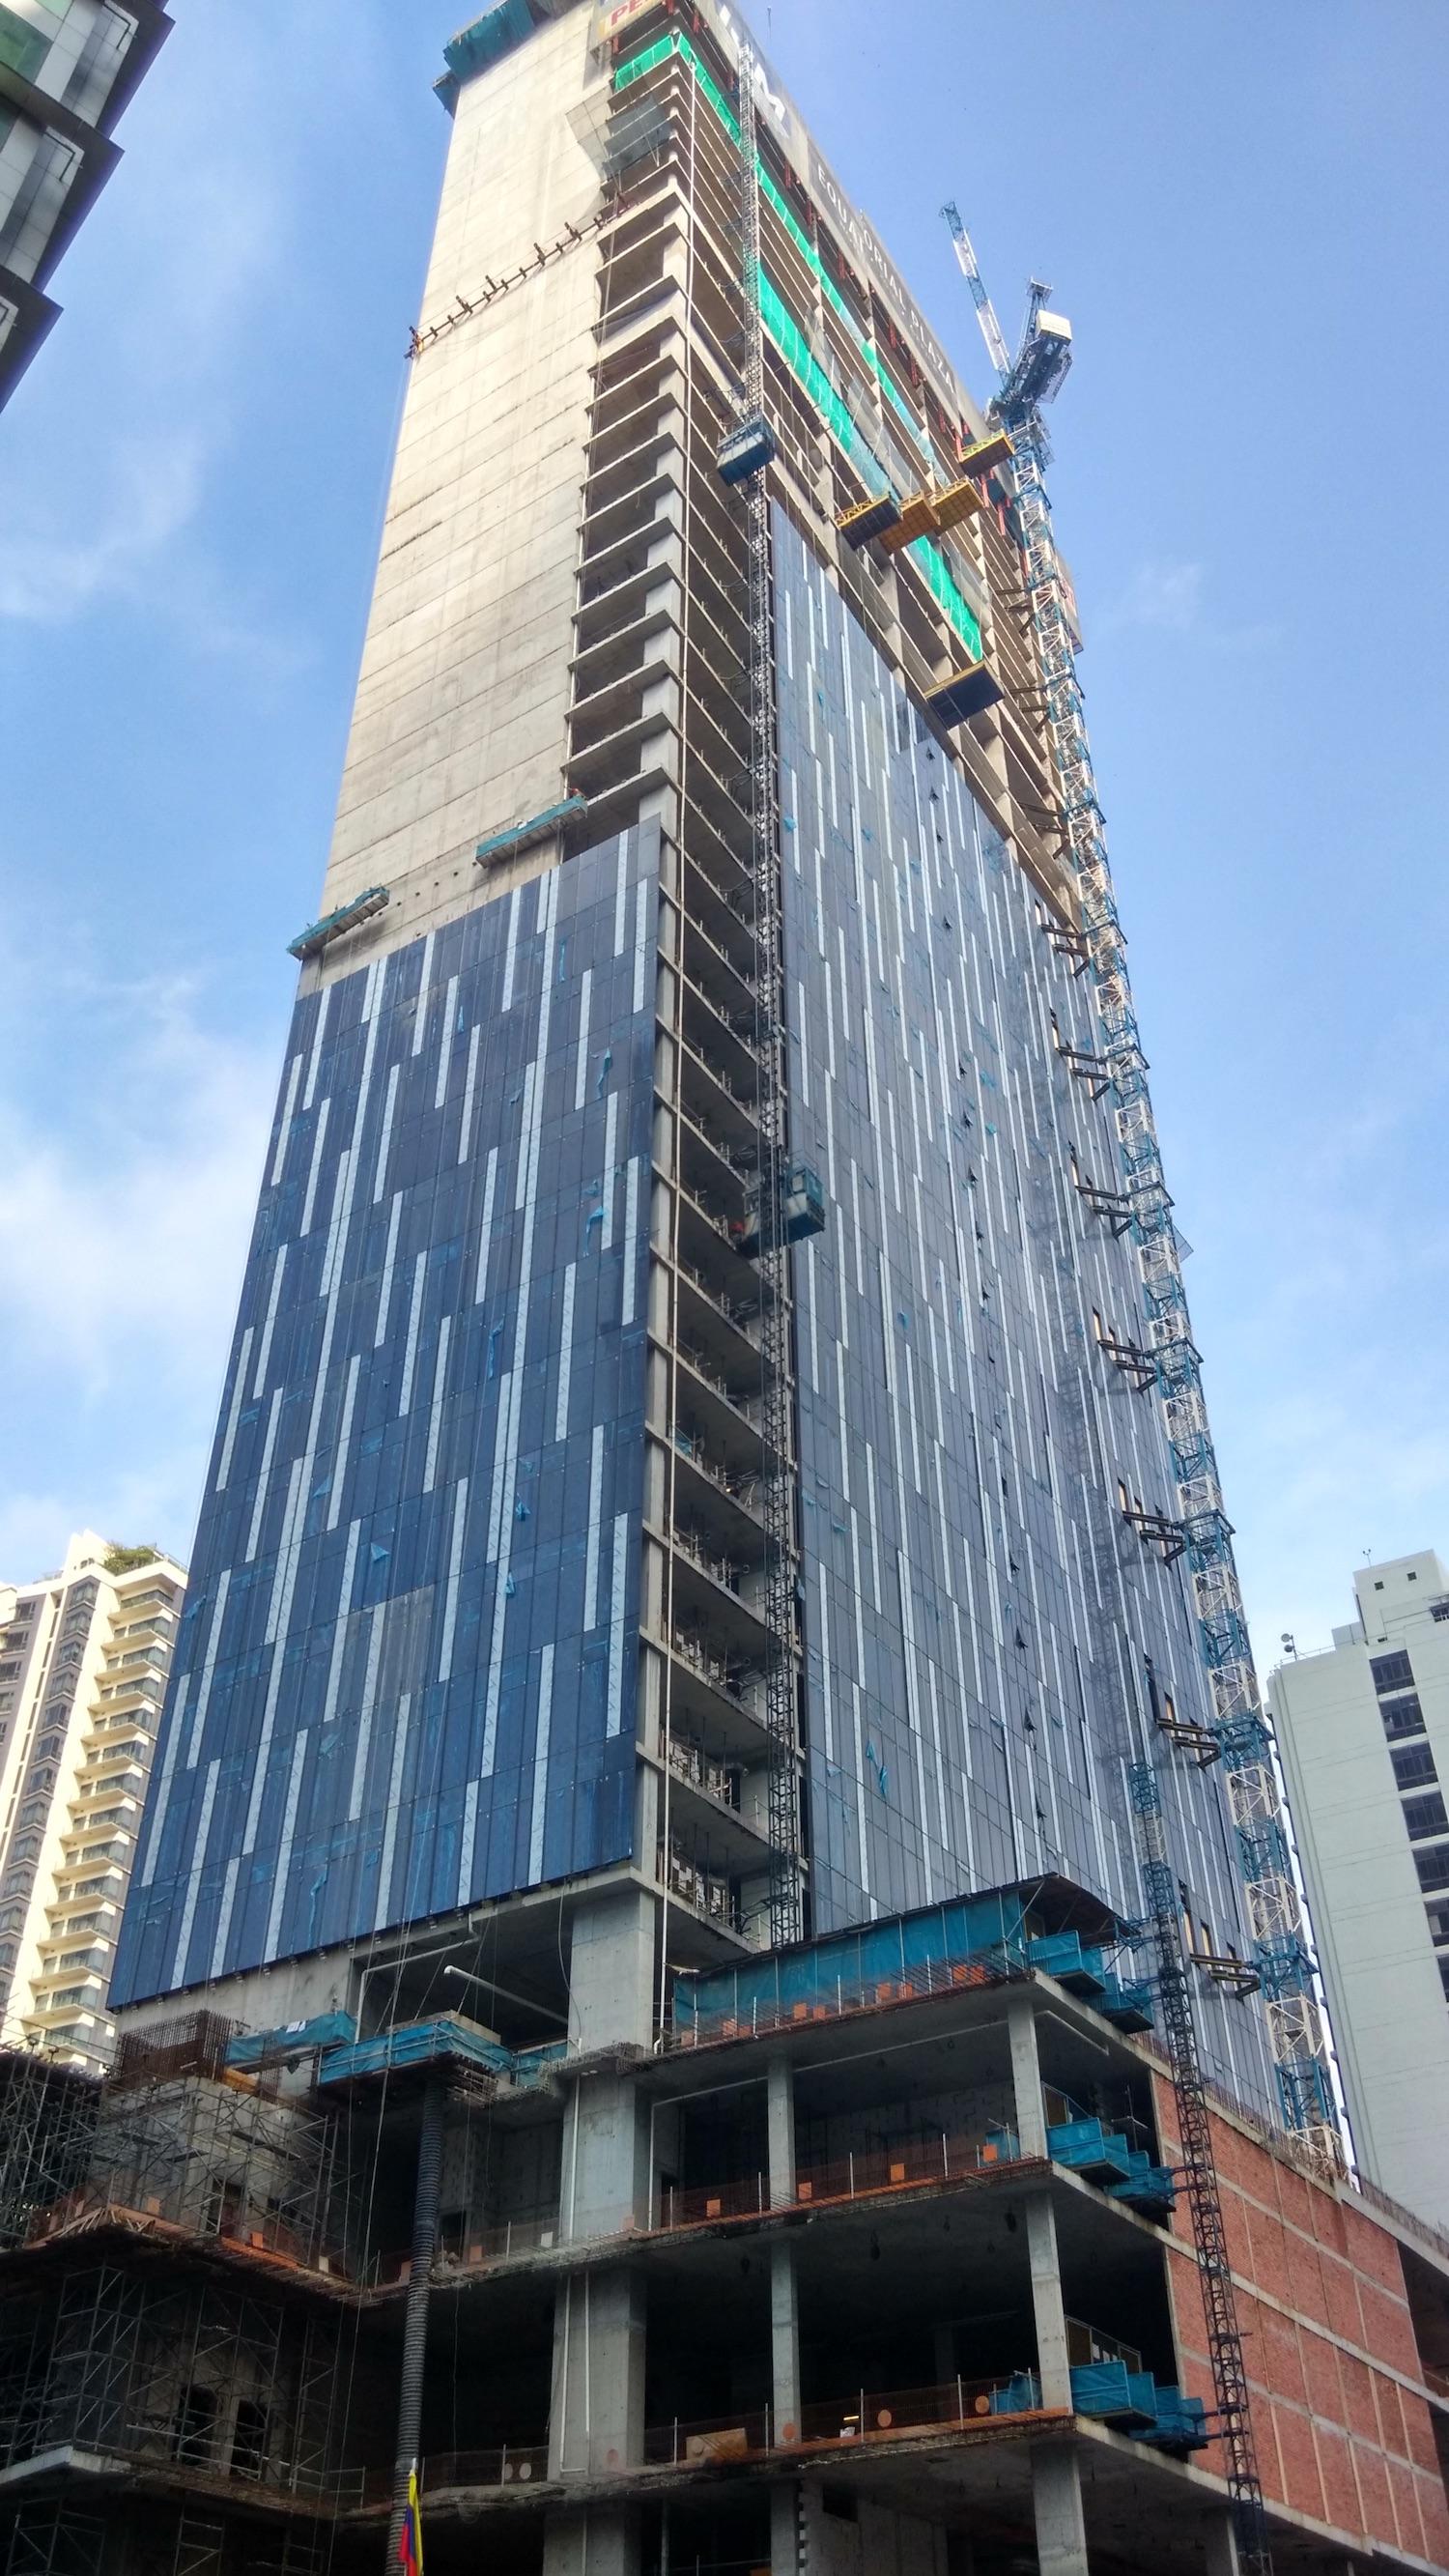 Construction Progress - Jalan Perak